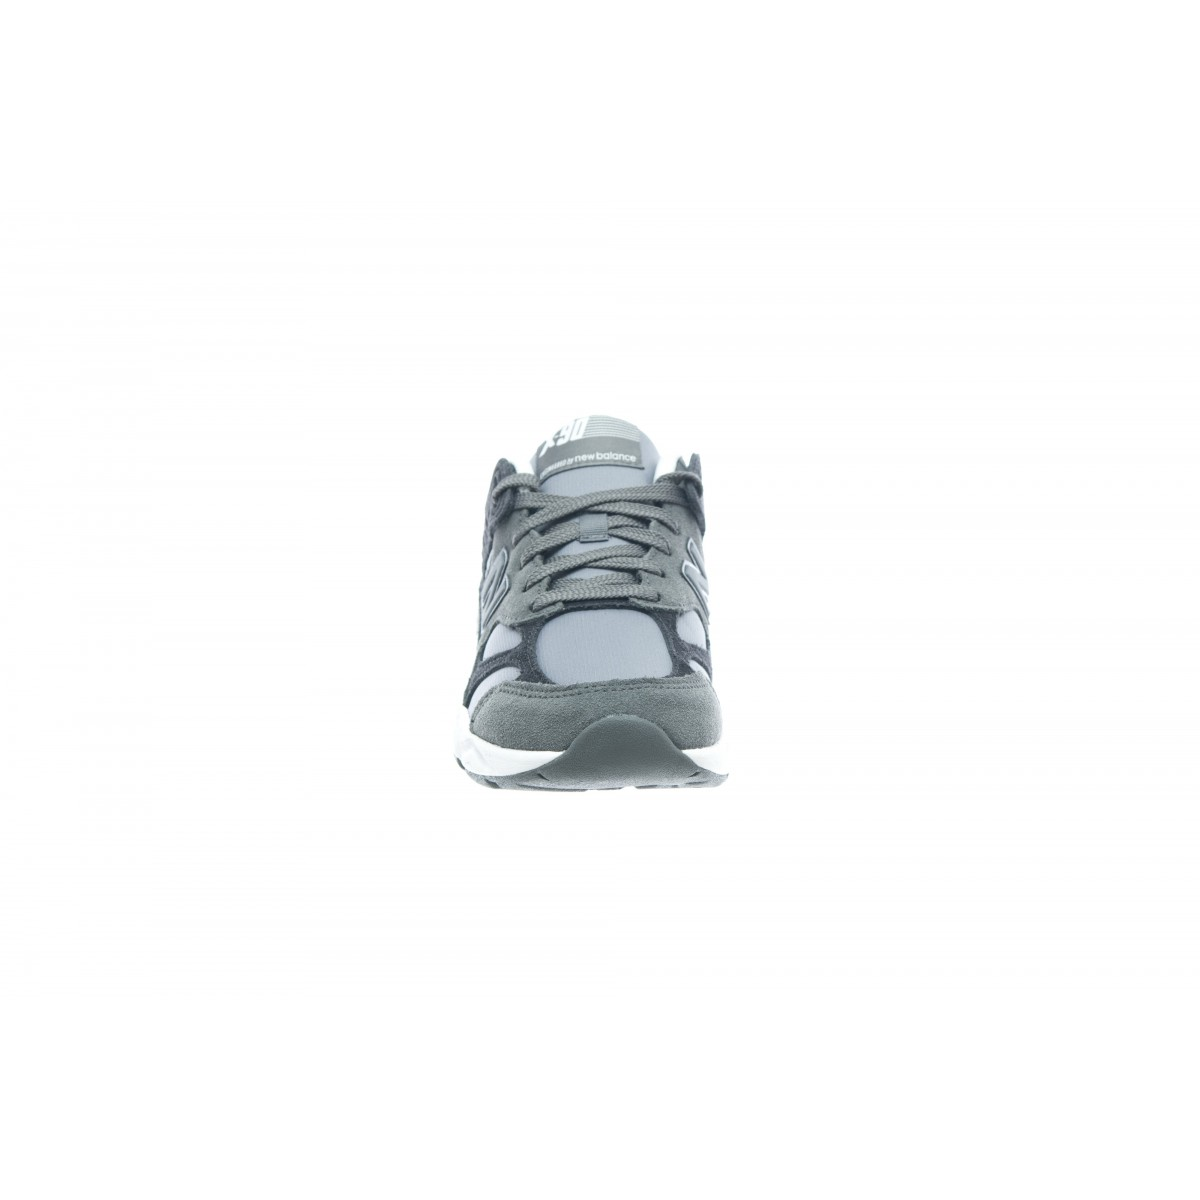 Scarpa - Wsx90 trb